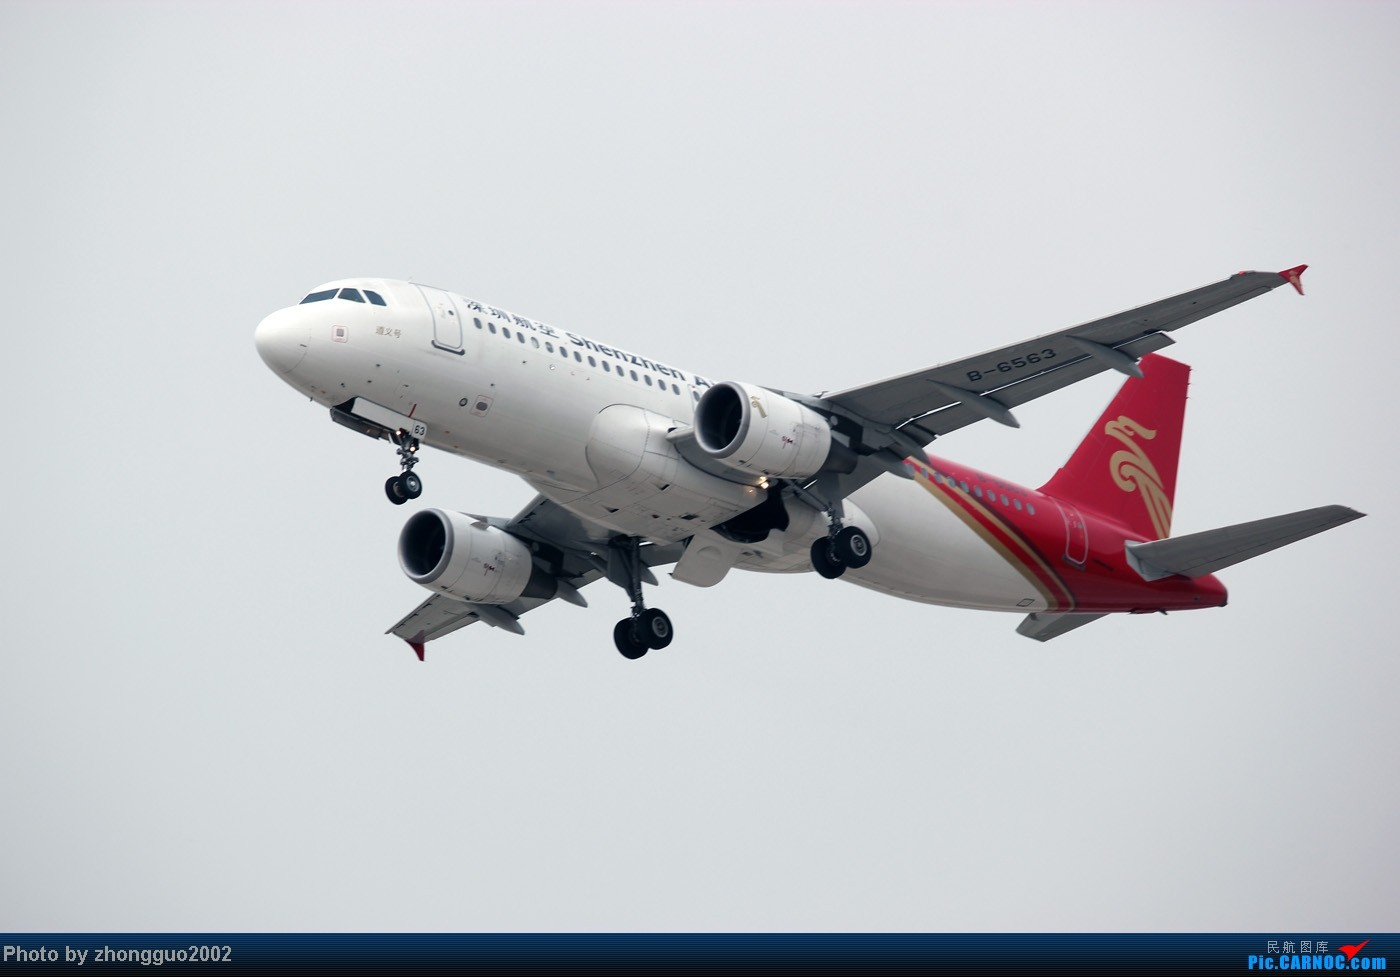 Re:[原创]随着2012年的最后一场雪的到了,我的2012年拍机工作也圆满的结束了,把这段时间里灰机整理一下,把没发的,我个人认为好的发上来! AIRBUS A320-200 B-6563 中国呼和浩特白塔国际机场